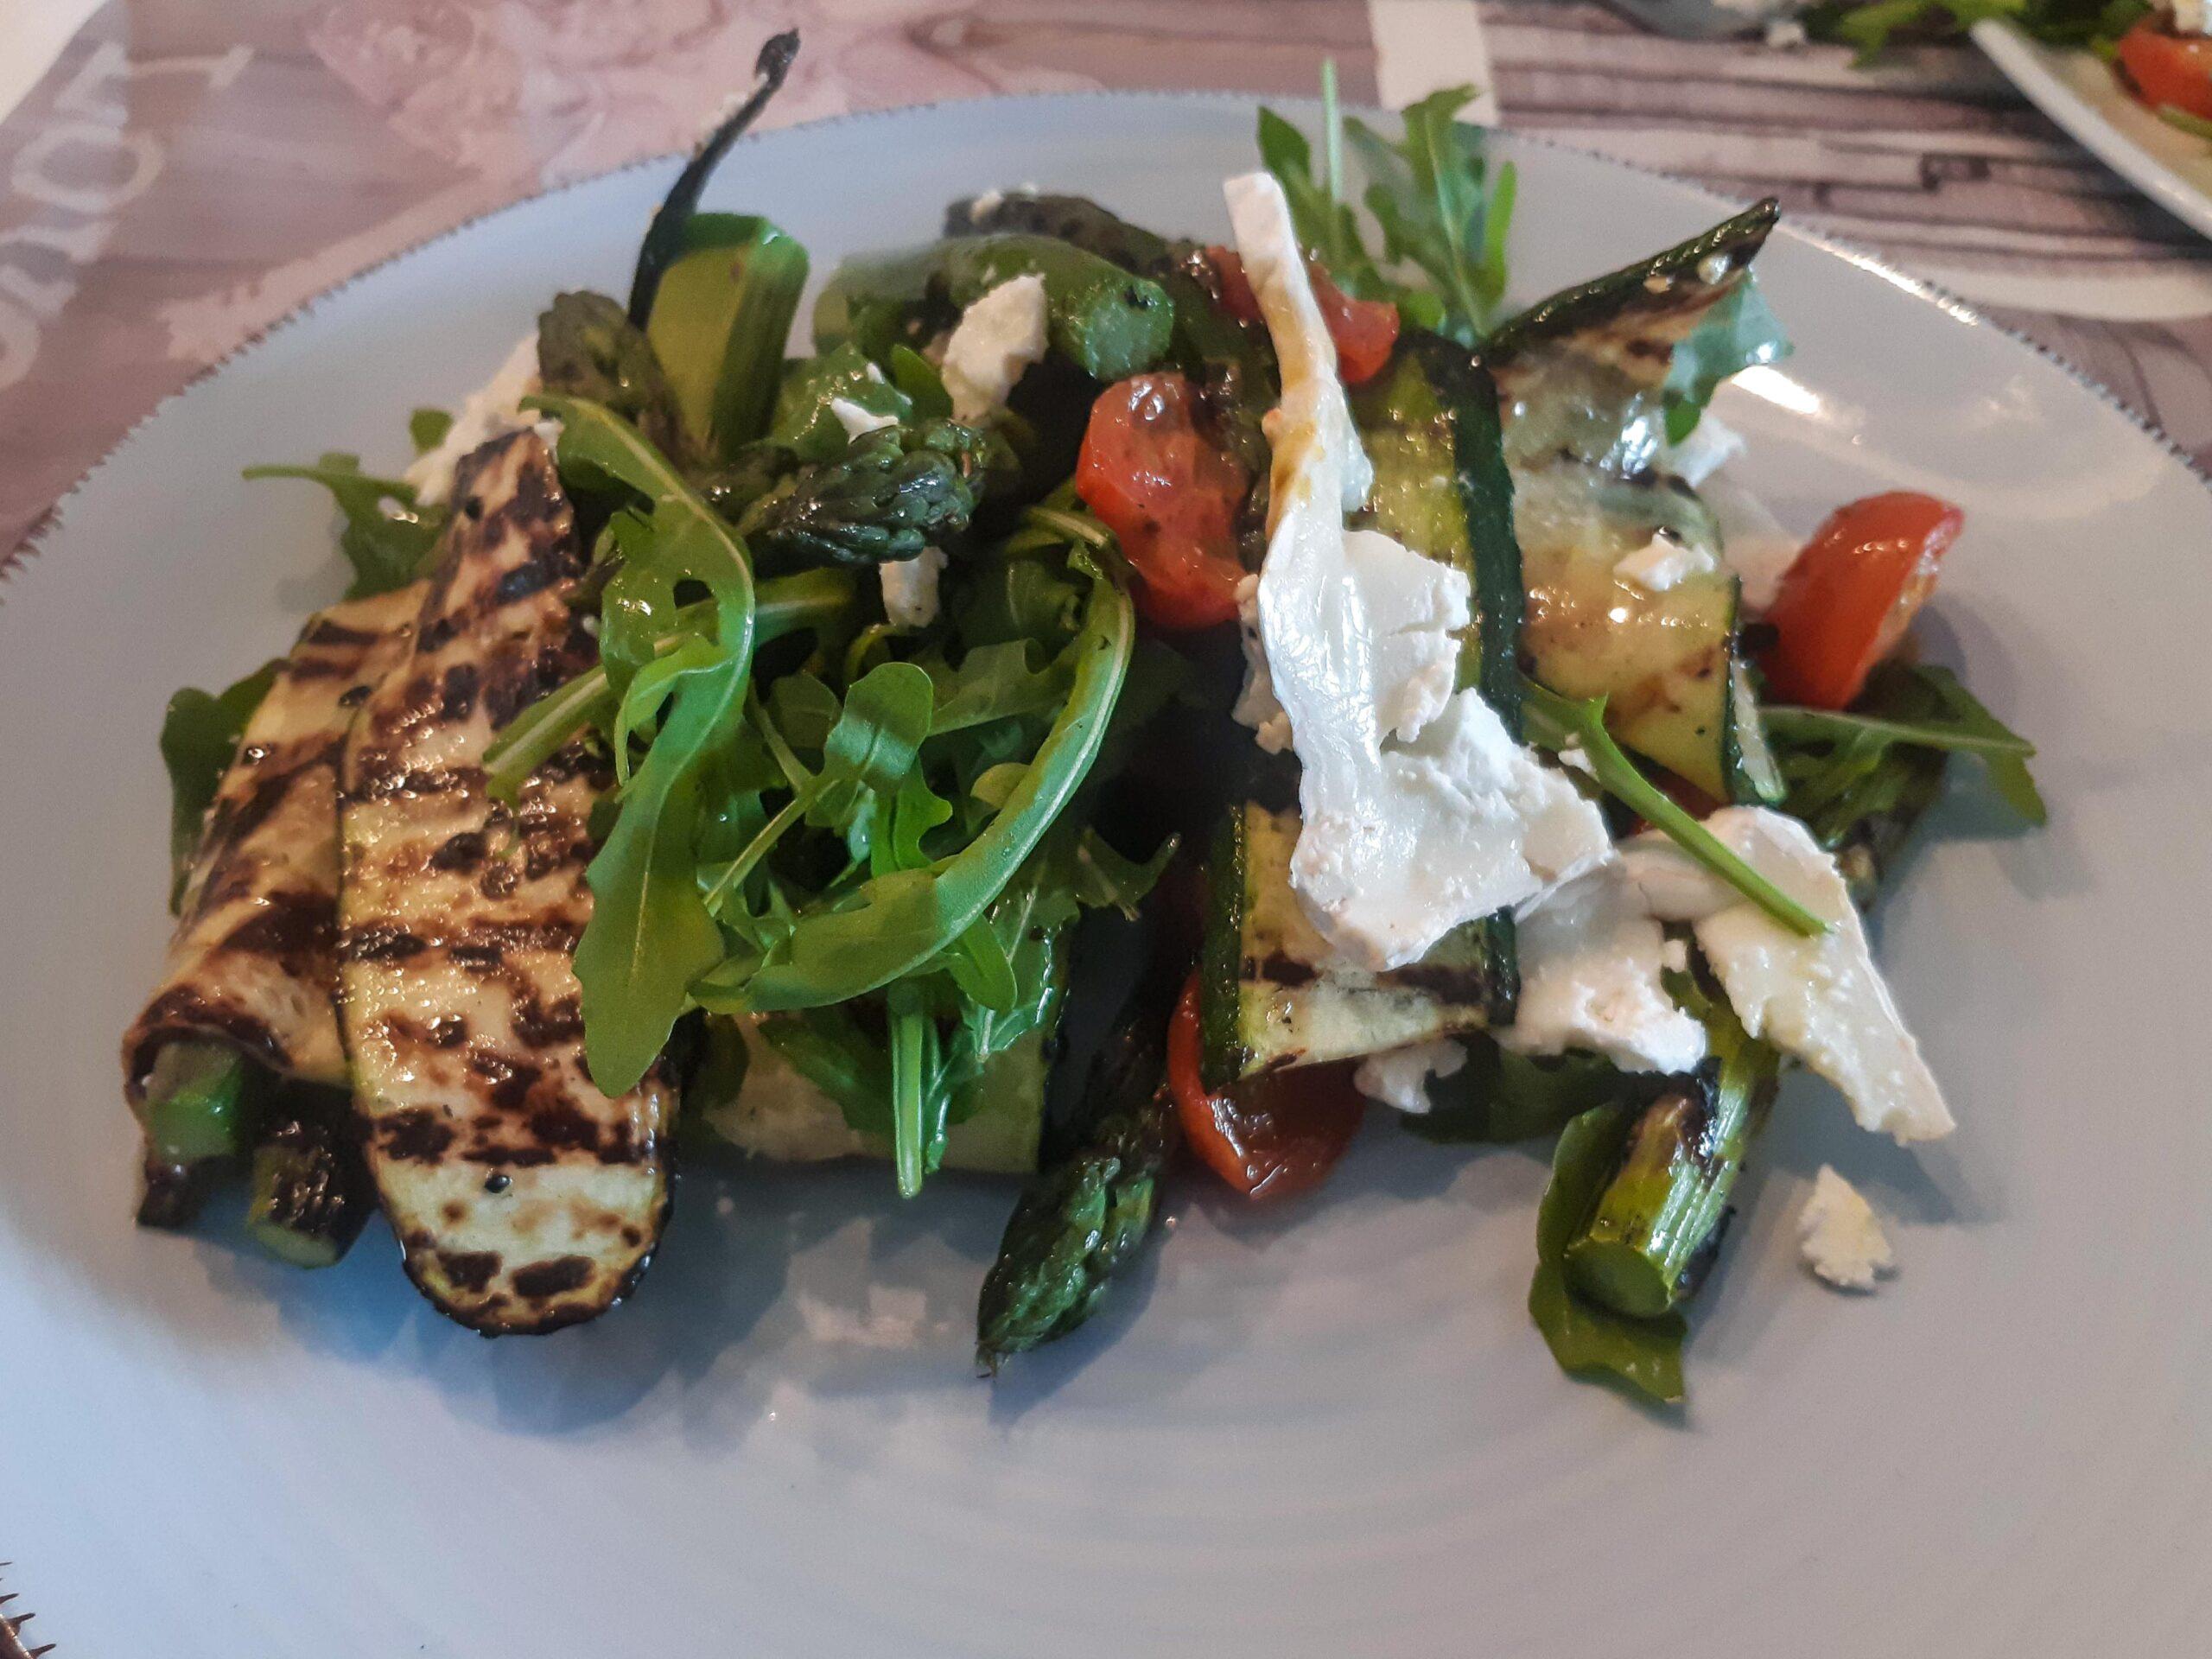 Ottolenghi: Salade van geroosterde asperges, courgettes en manouri